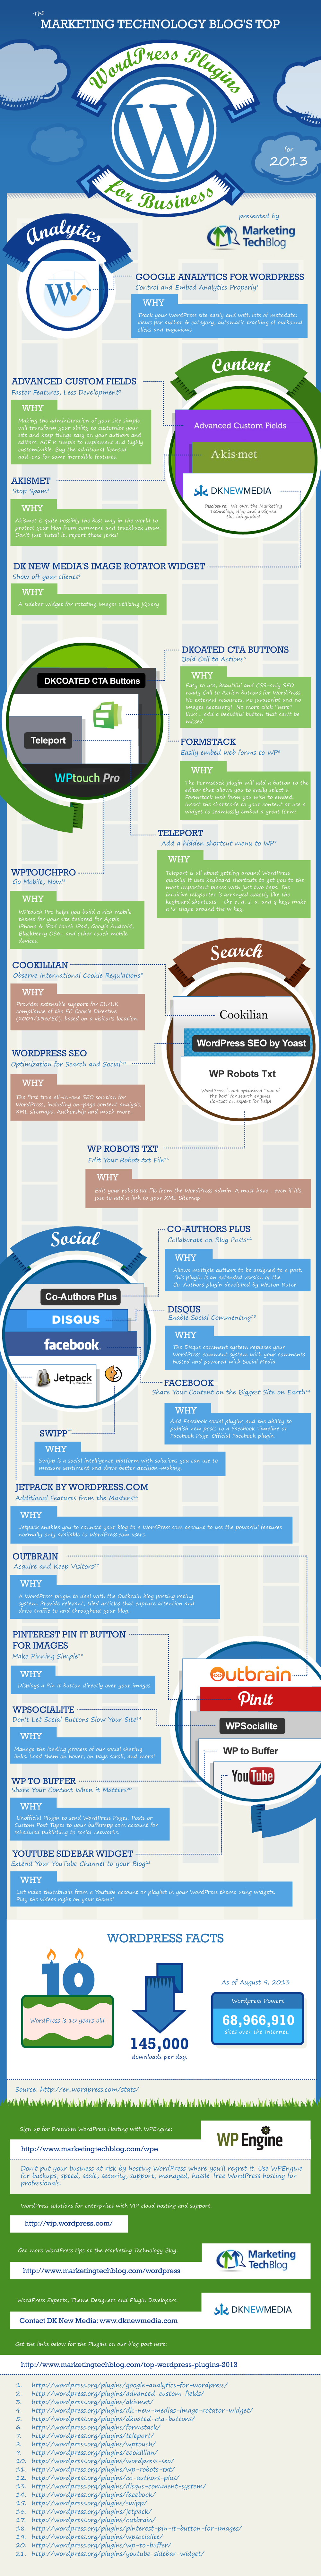 Top Business WordPress Plugins